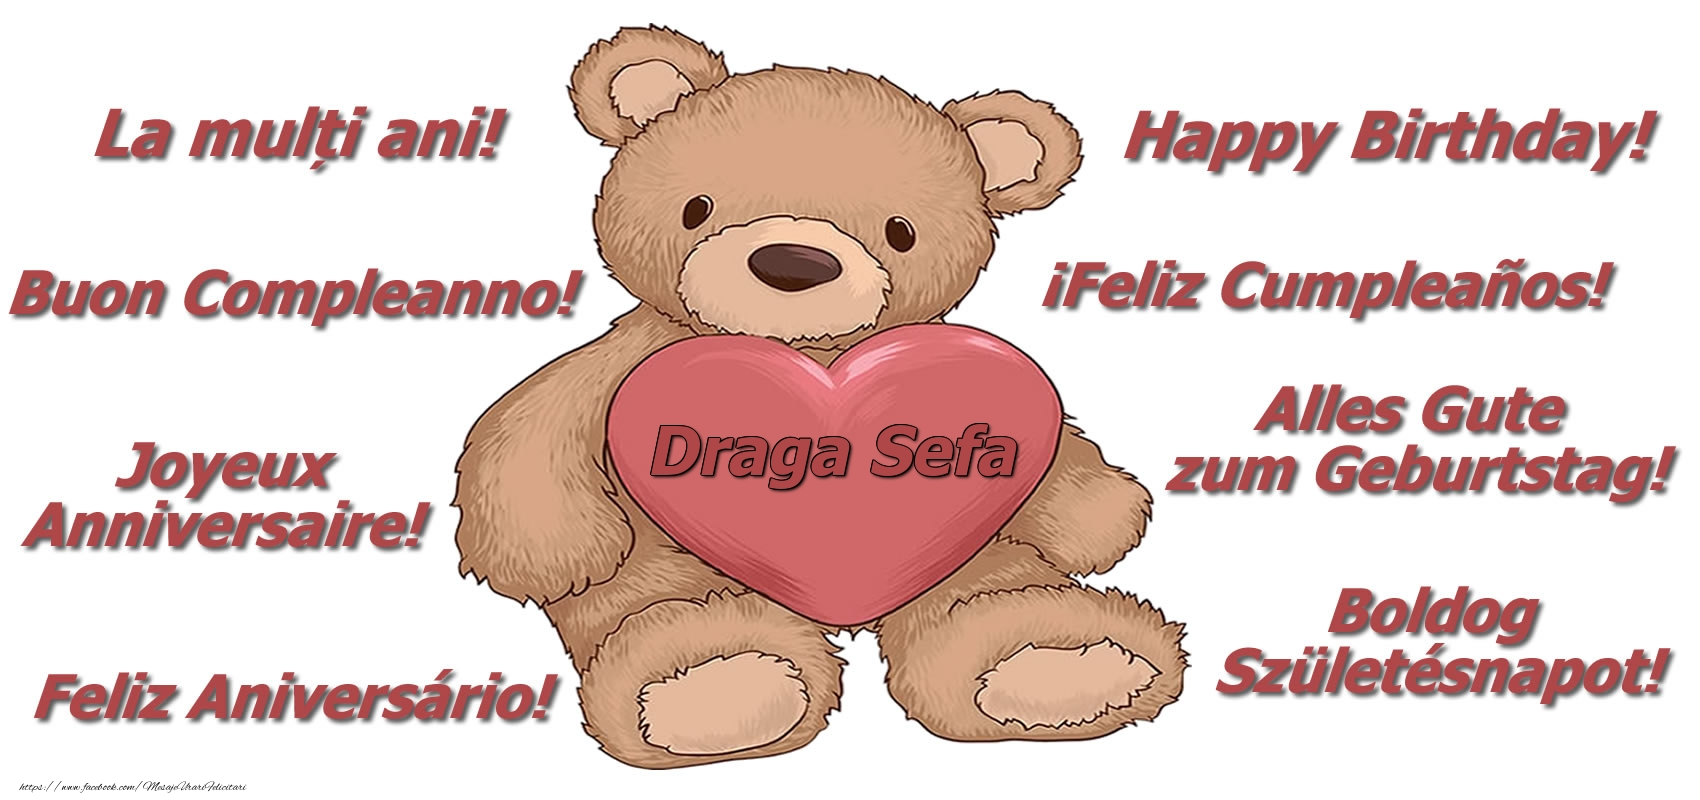 Felicitari frumoase de zi de nastere pentru Sefa | La multi ani draga sefa! - Ursulet